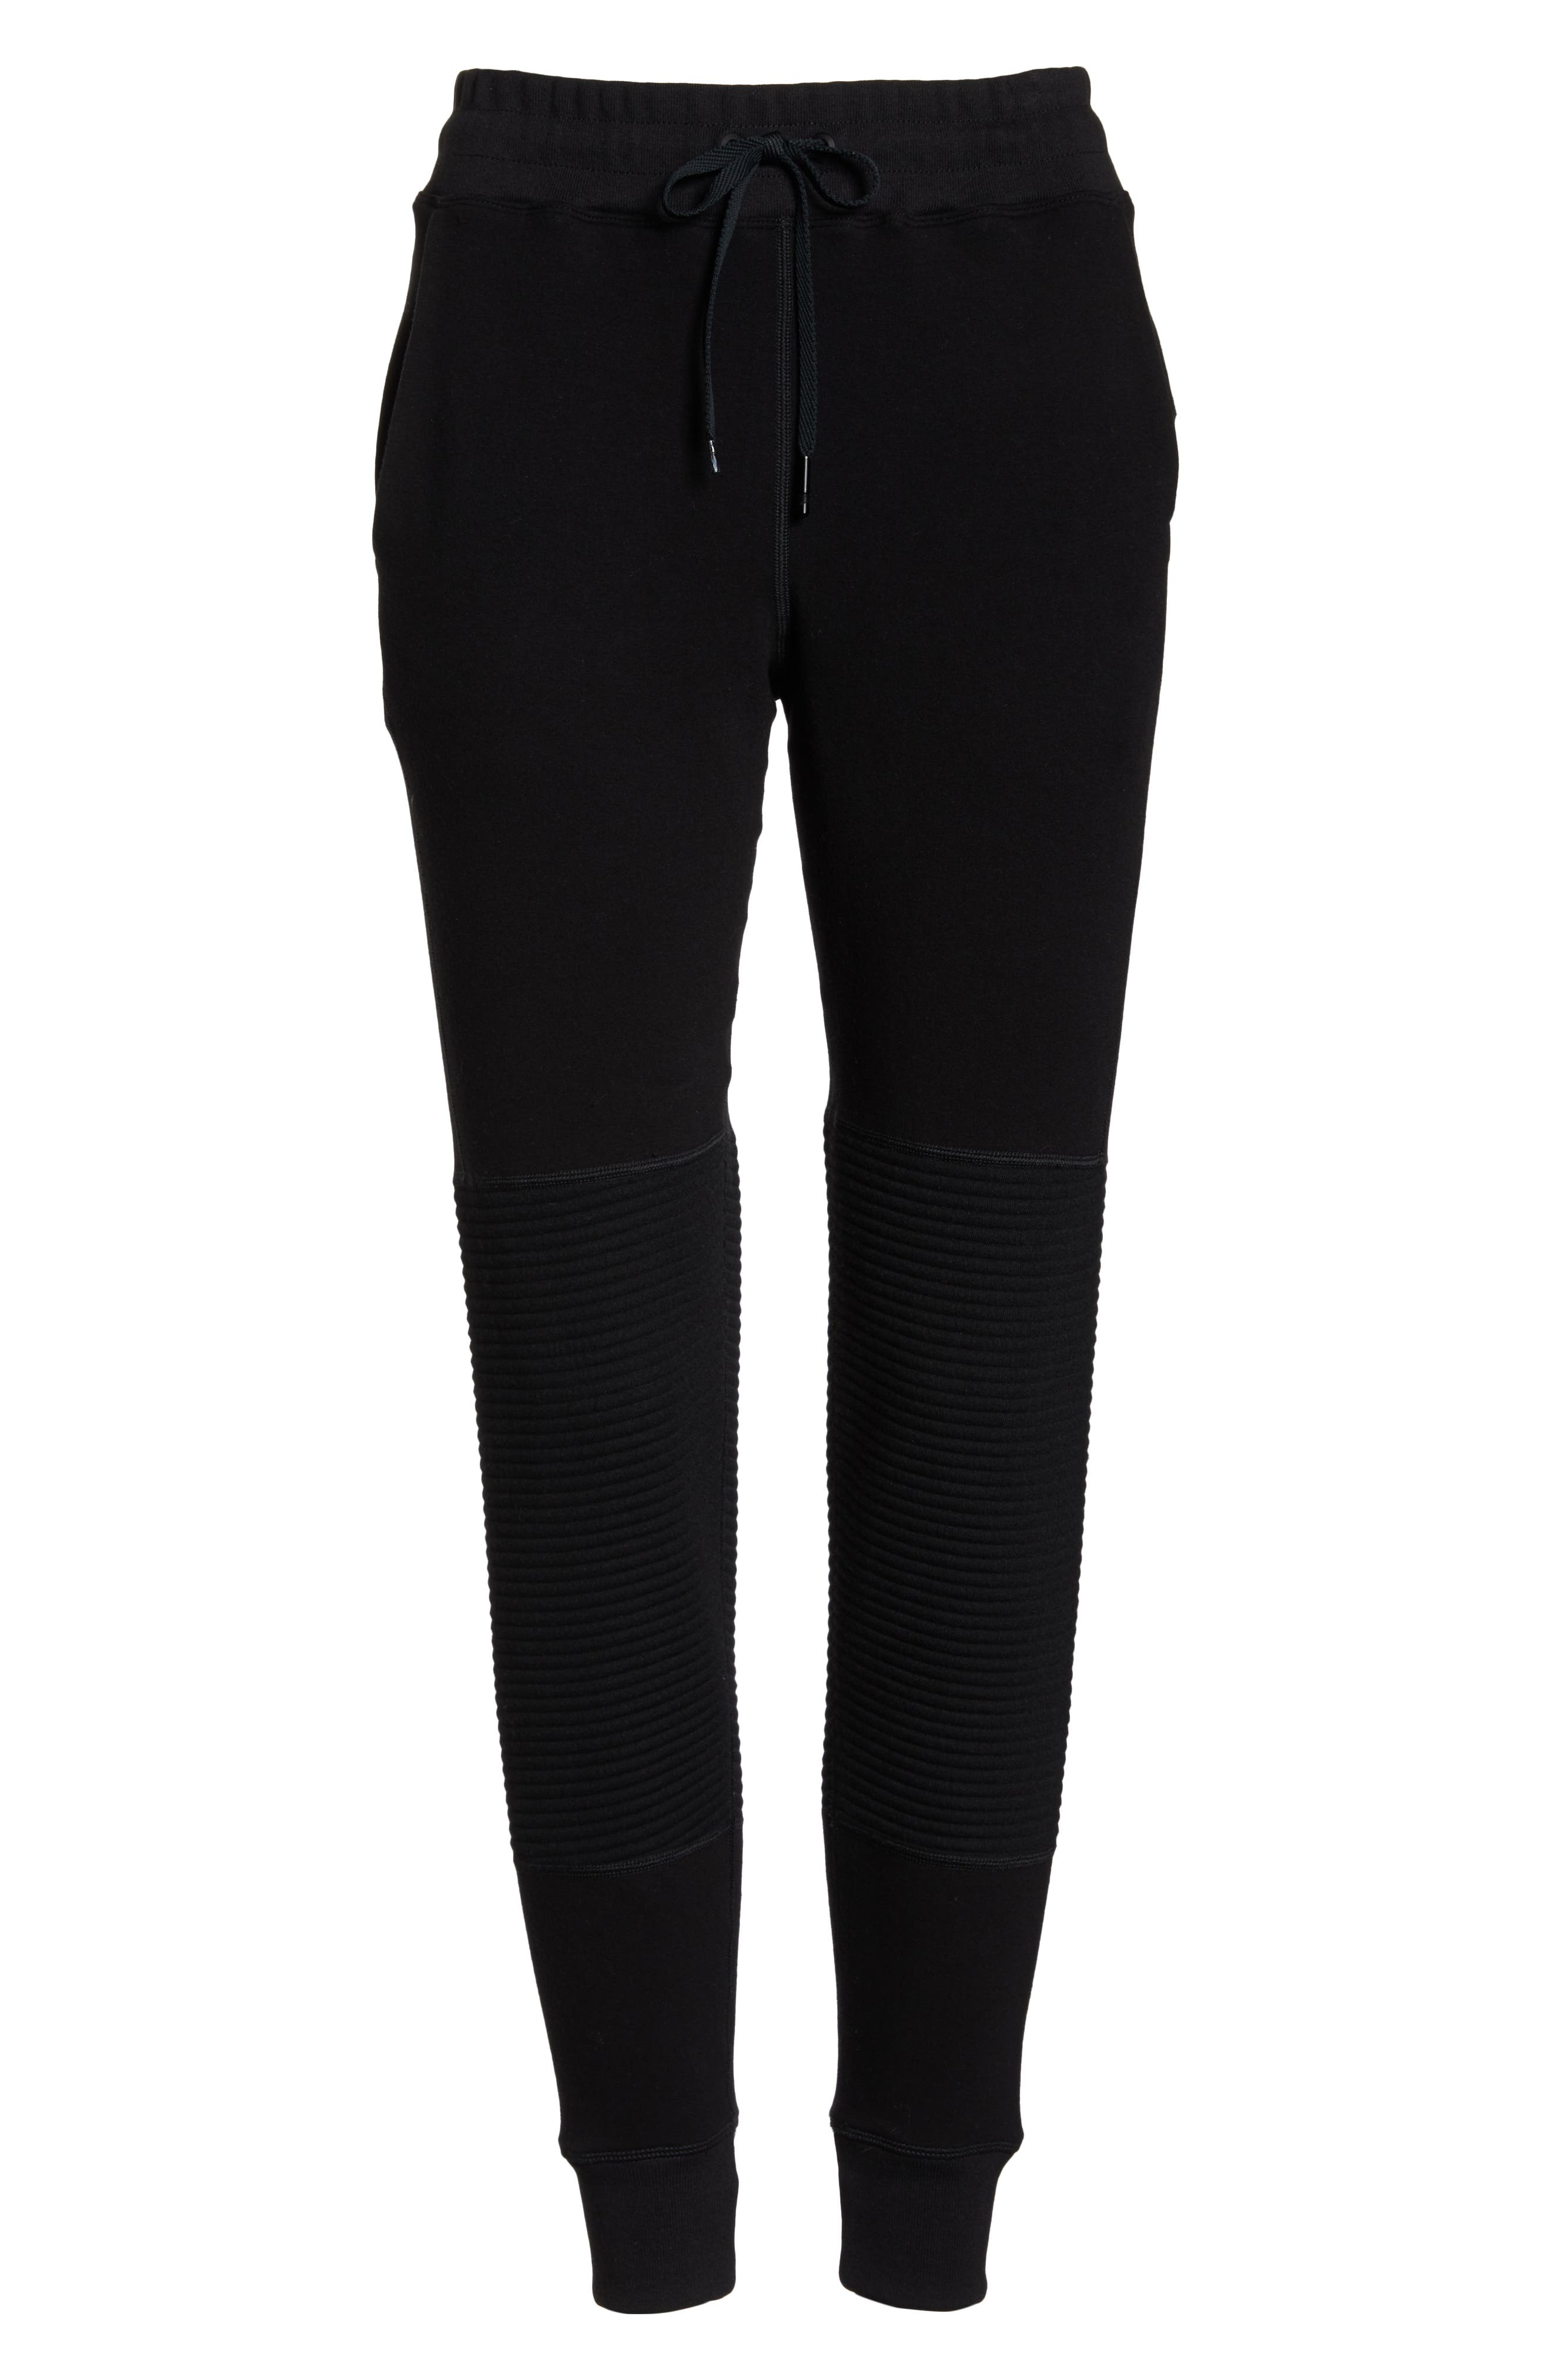 Moto Sweatpants,                             Alternate thumbnail 7, color,                             BLACK